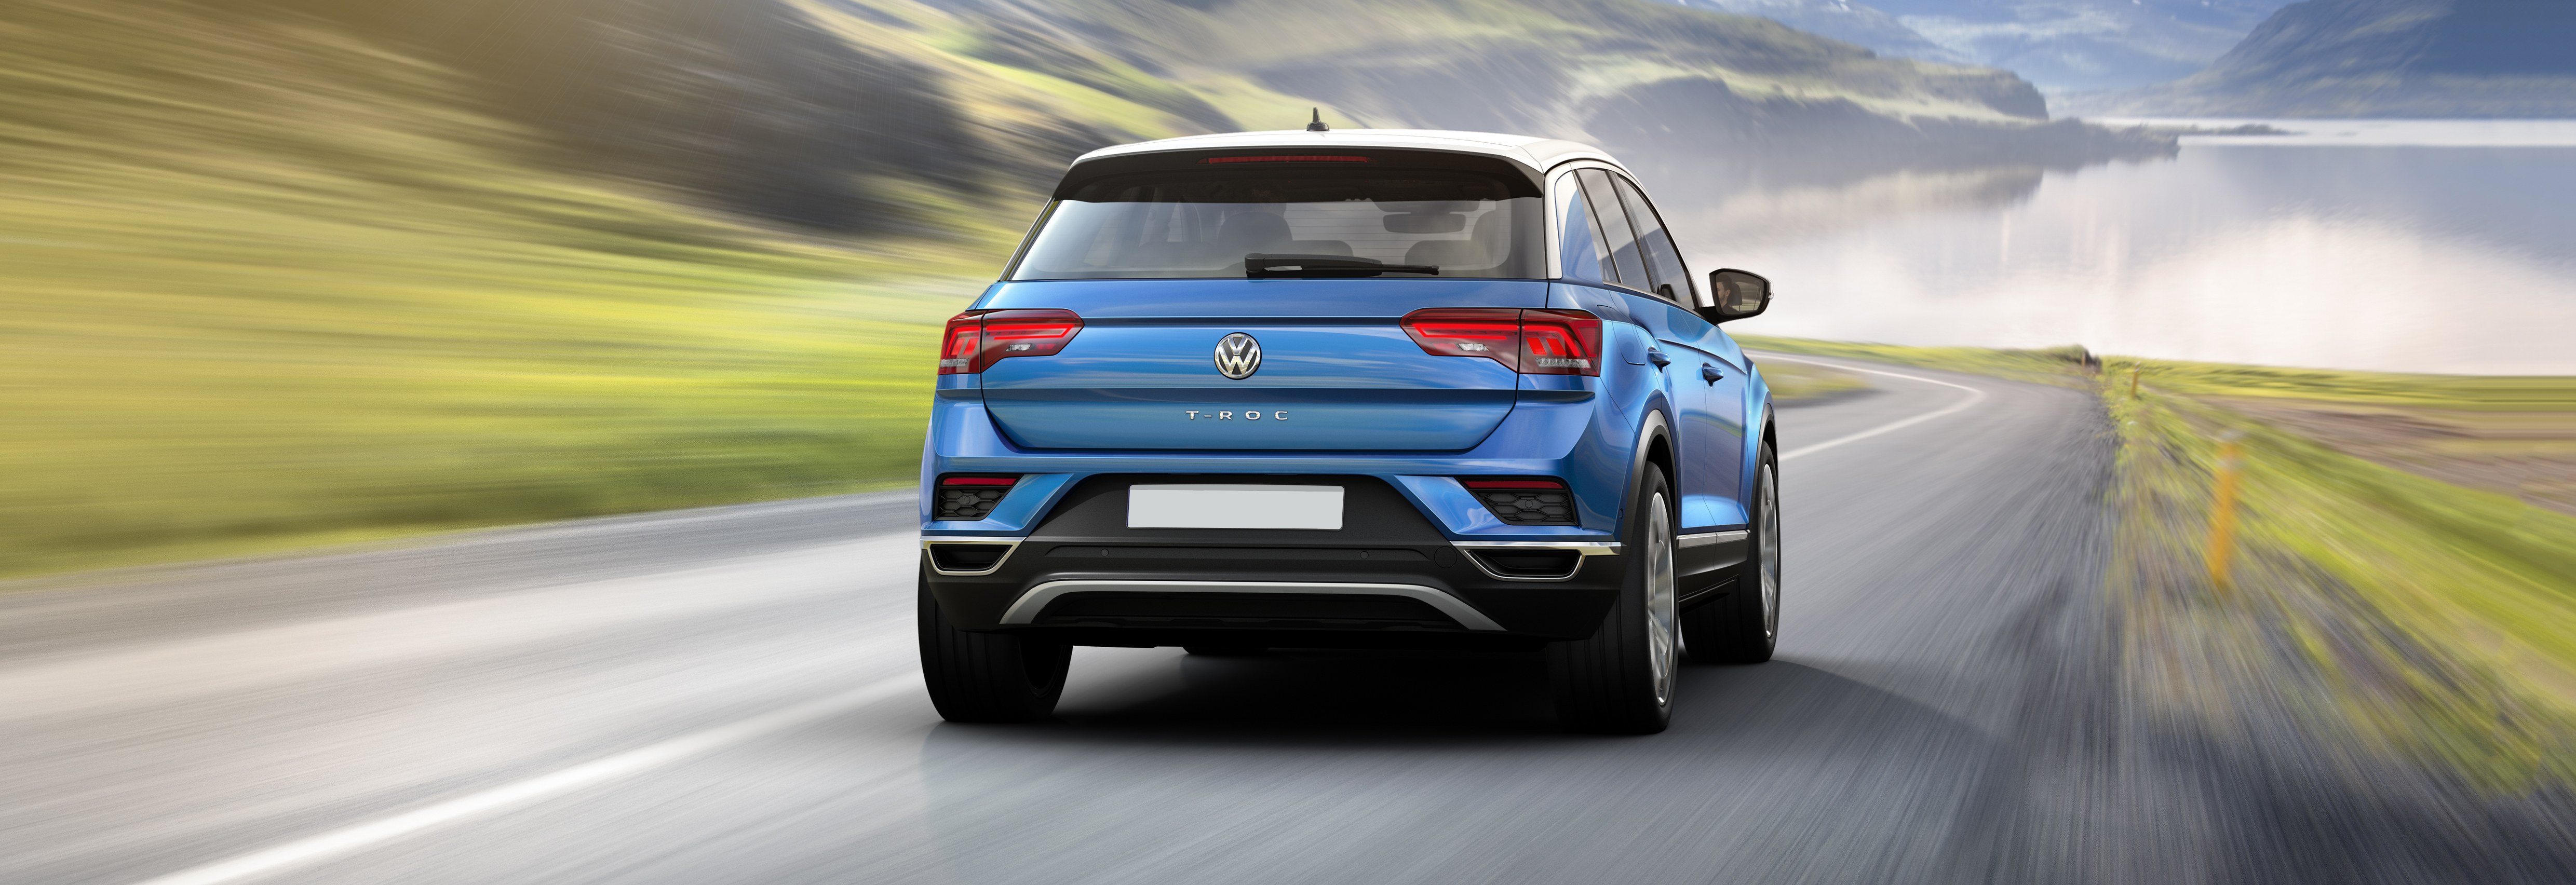 2018 volkswagen hybrid. plain volkswagen 2018 vw troc price and release date inside volkswagen hybrid